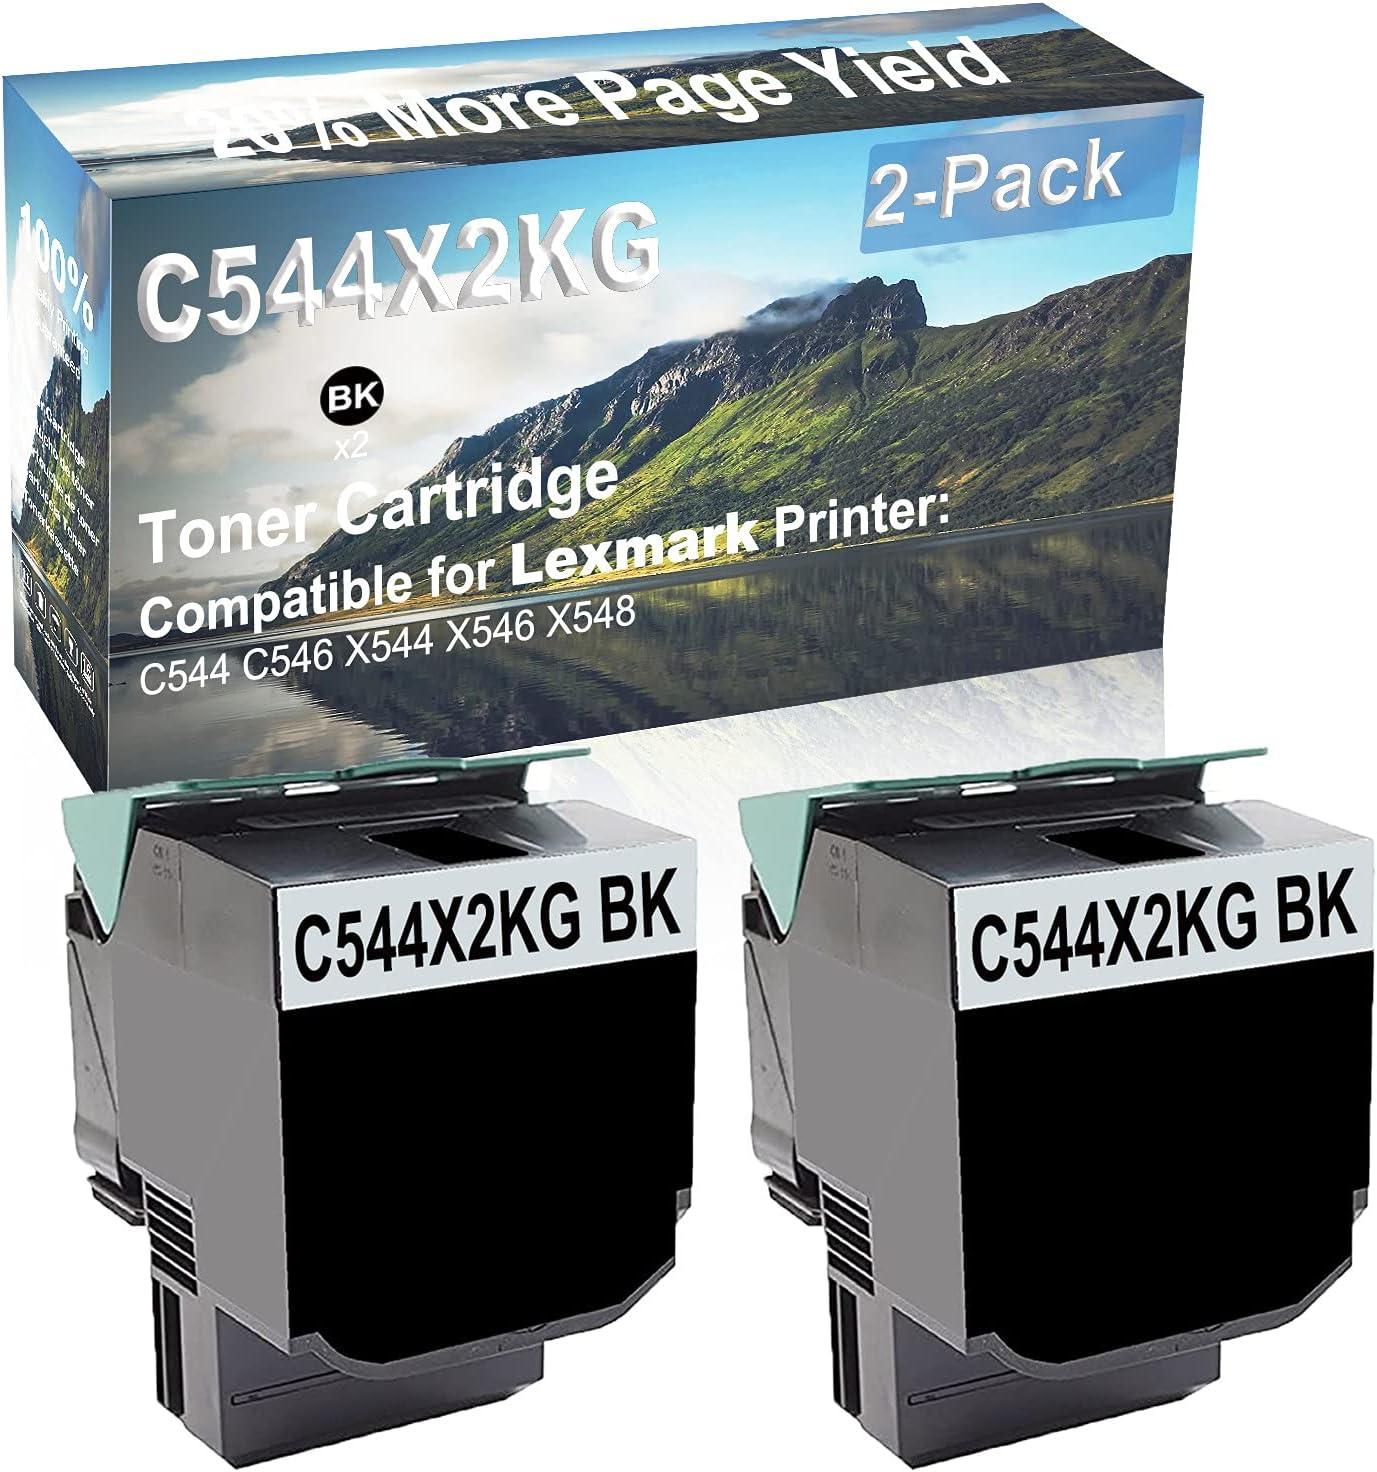 2-Pack (Black) Compatible High Yield C544X2KG Laser Printer Toner Cartridge Used for Lexmark C544 C546 X544 X546 X548 Printer